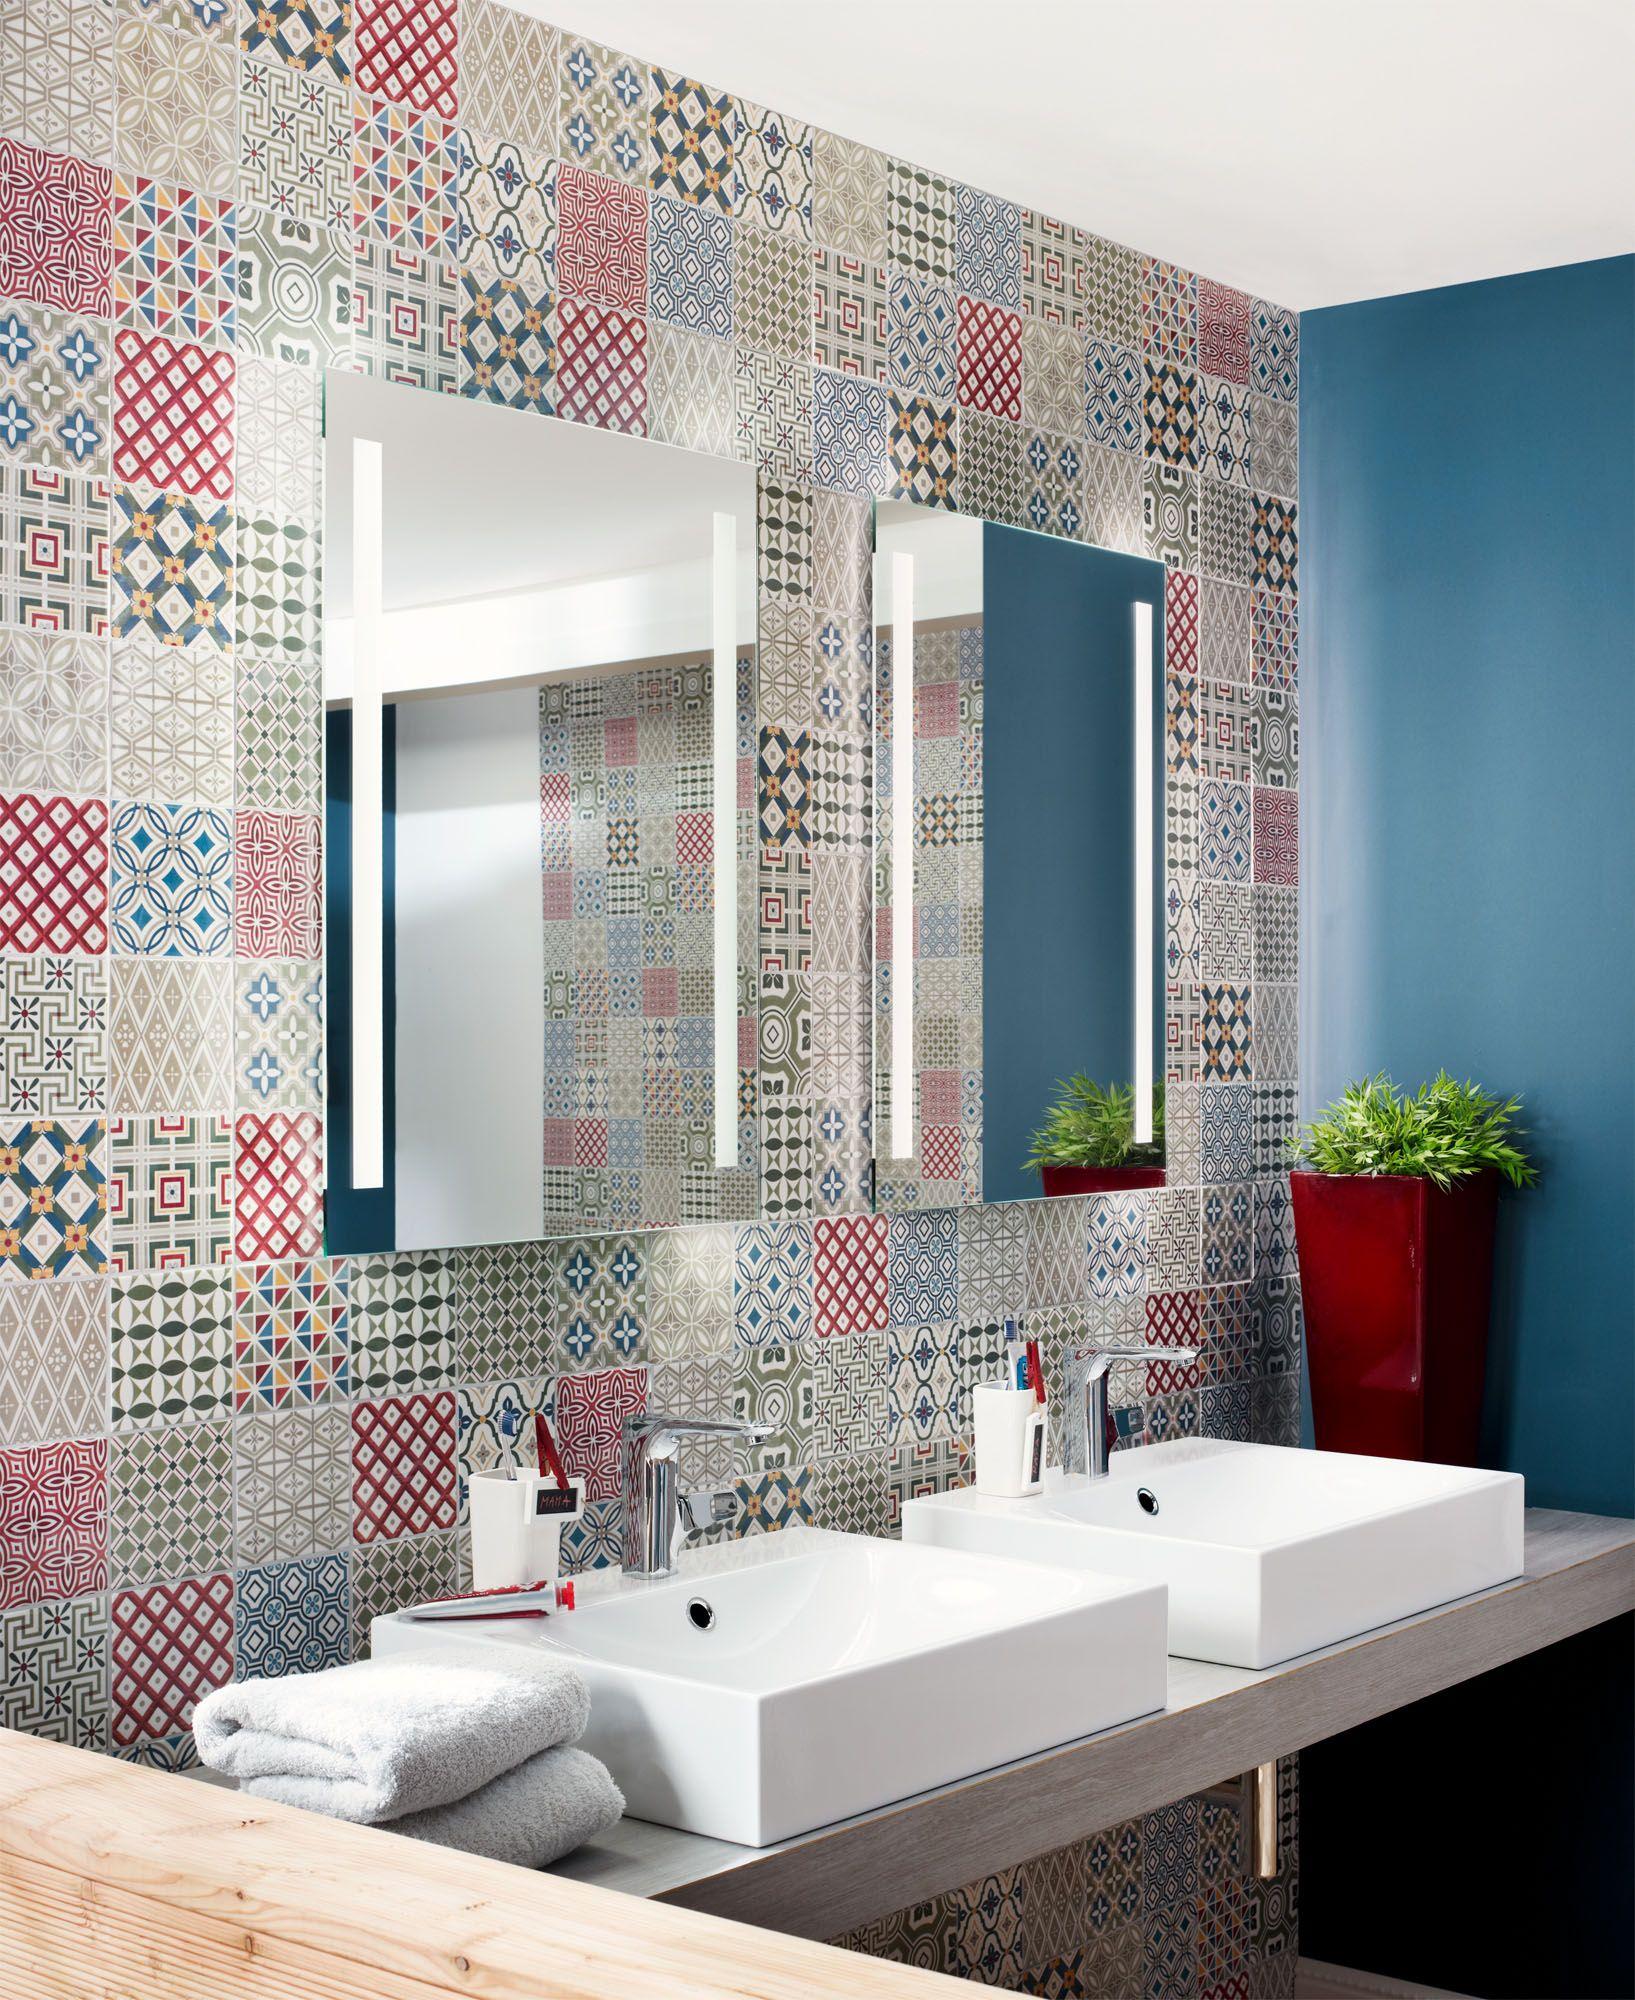 Patchwork Grande Badezimmerboden Badezimmer Boden Badezimmer Design